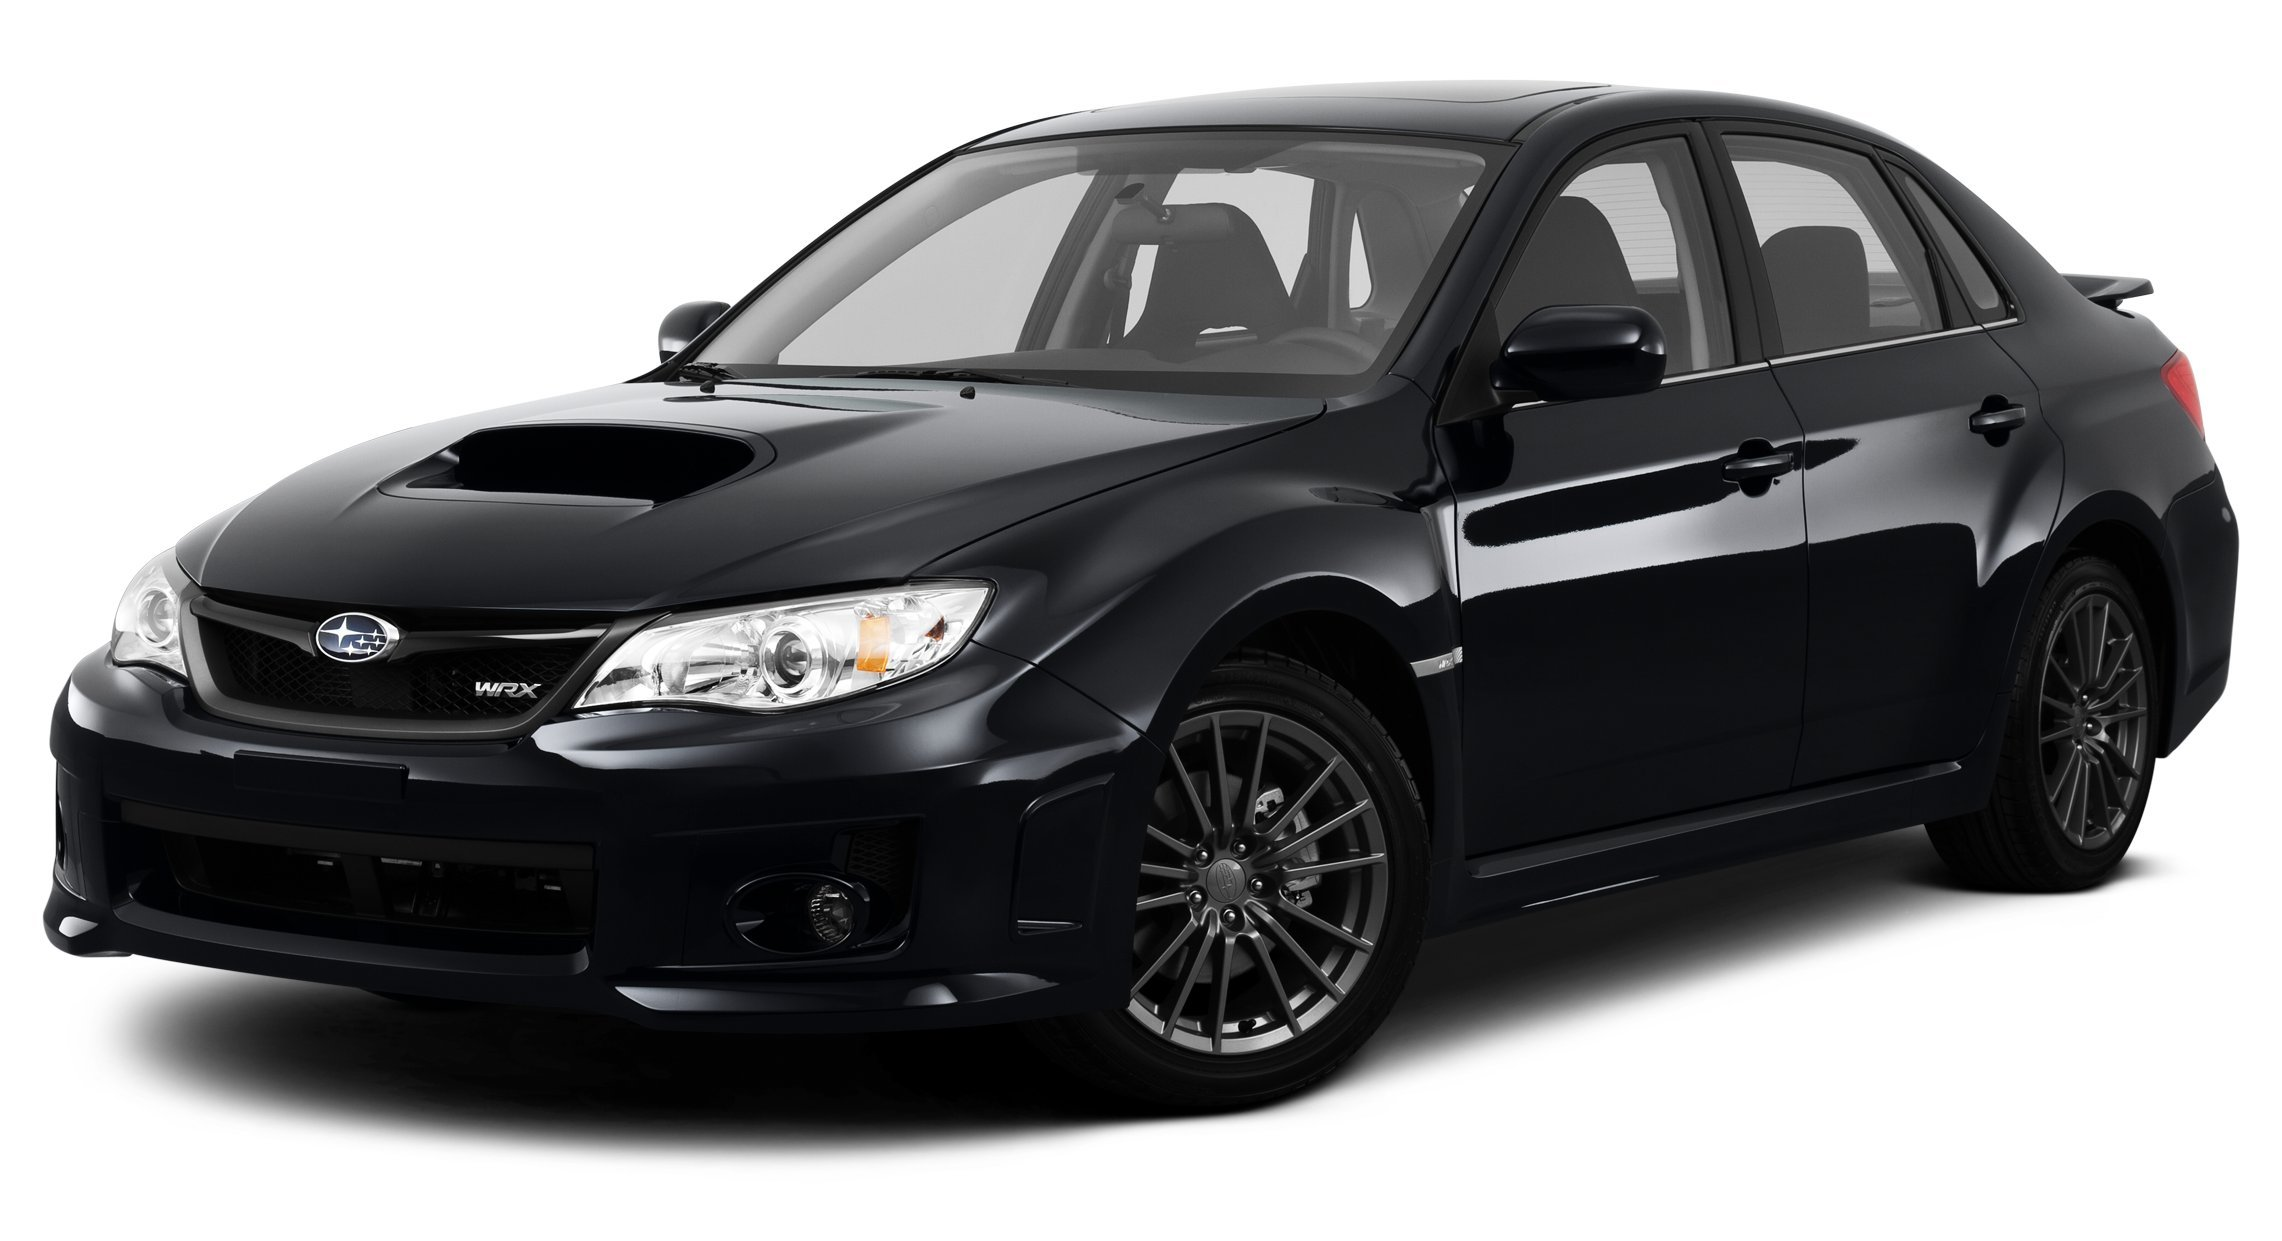 Amazon 2013 subaru impreza reviews images and specs vehicles 2013 subaru impreza wrx 4 door manual transmission vanachro Choice Image